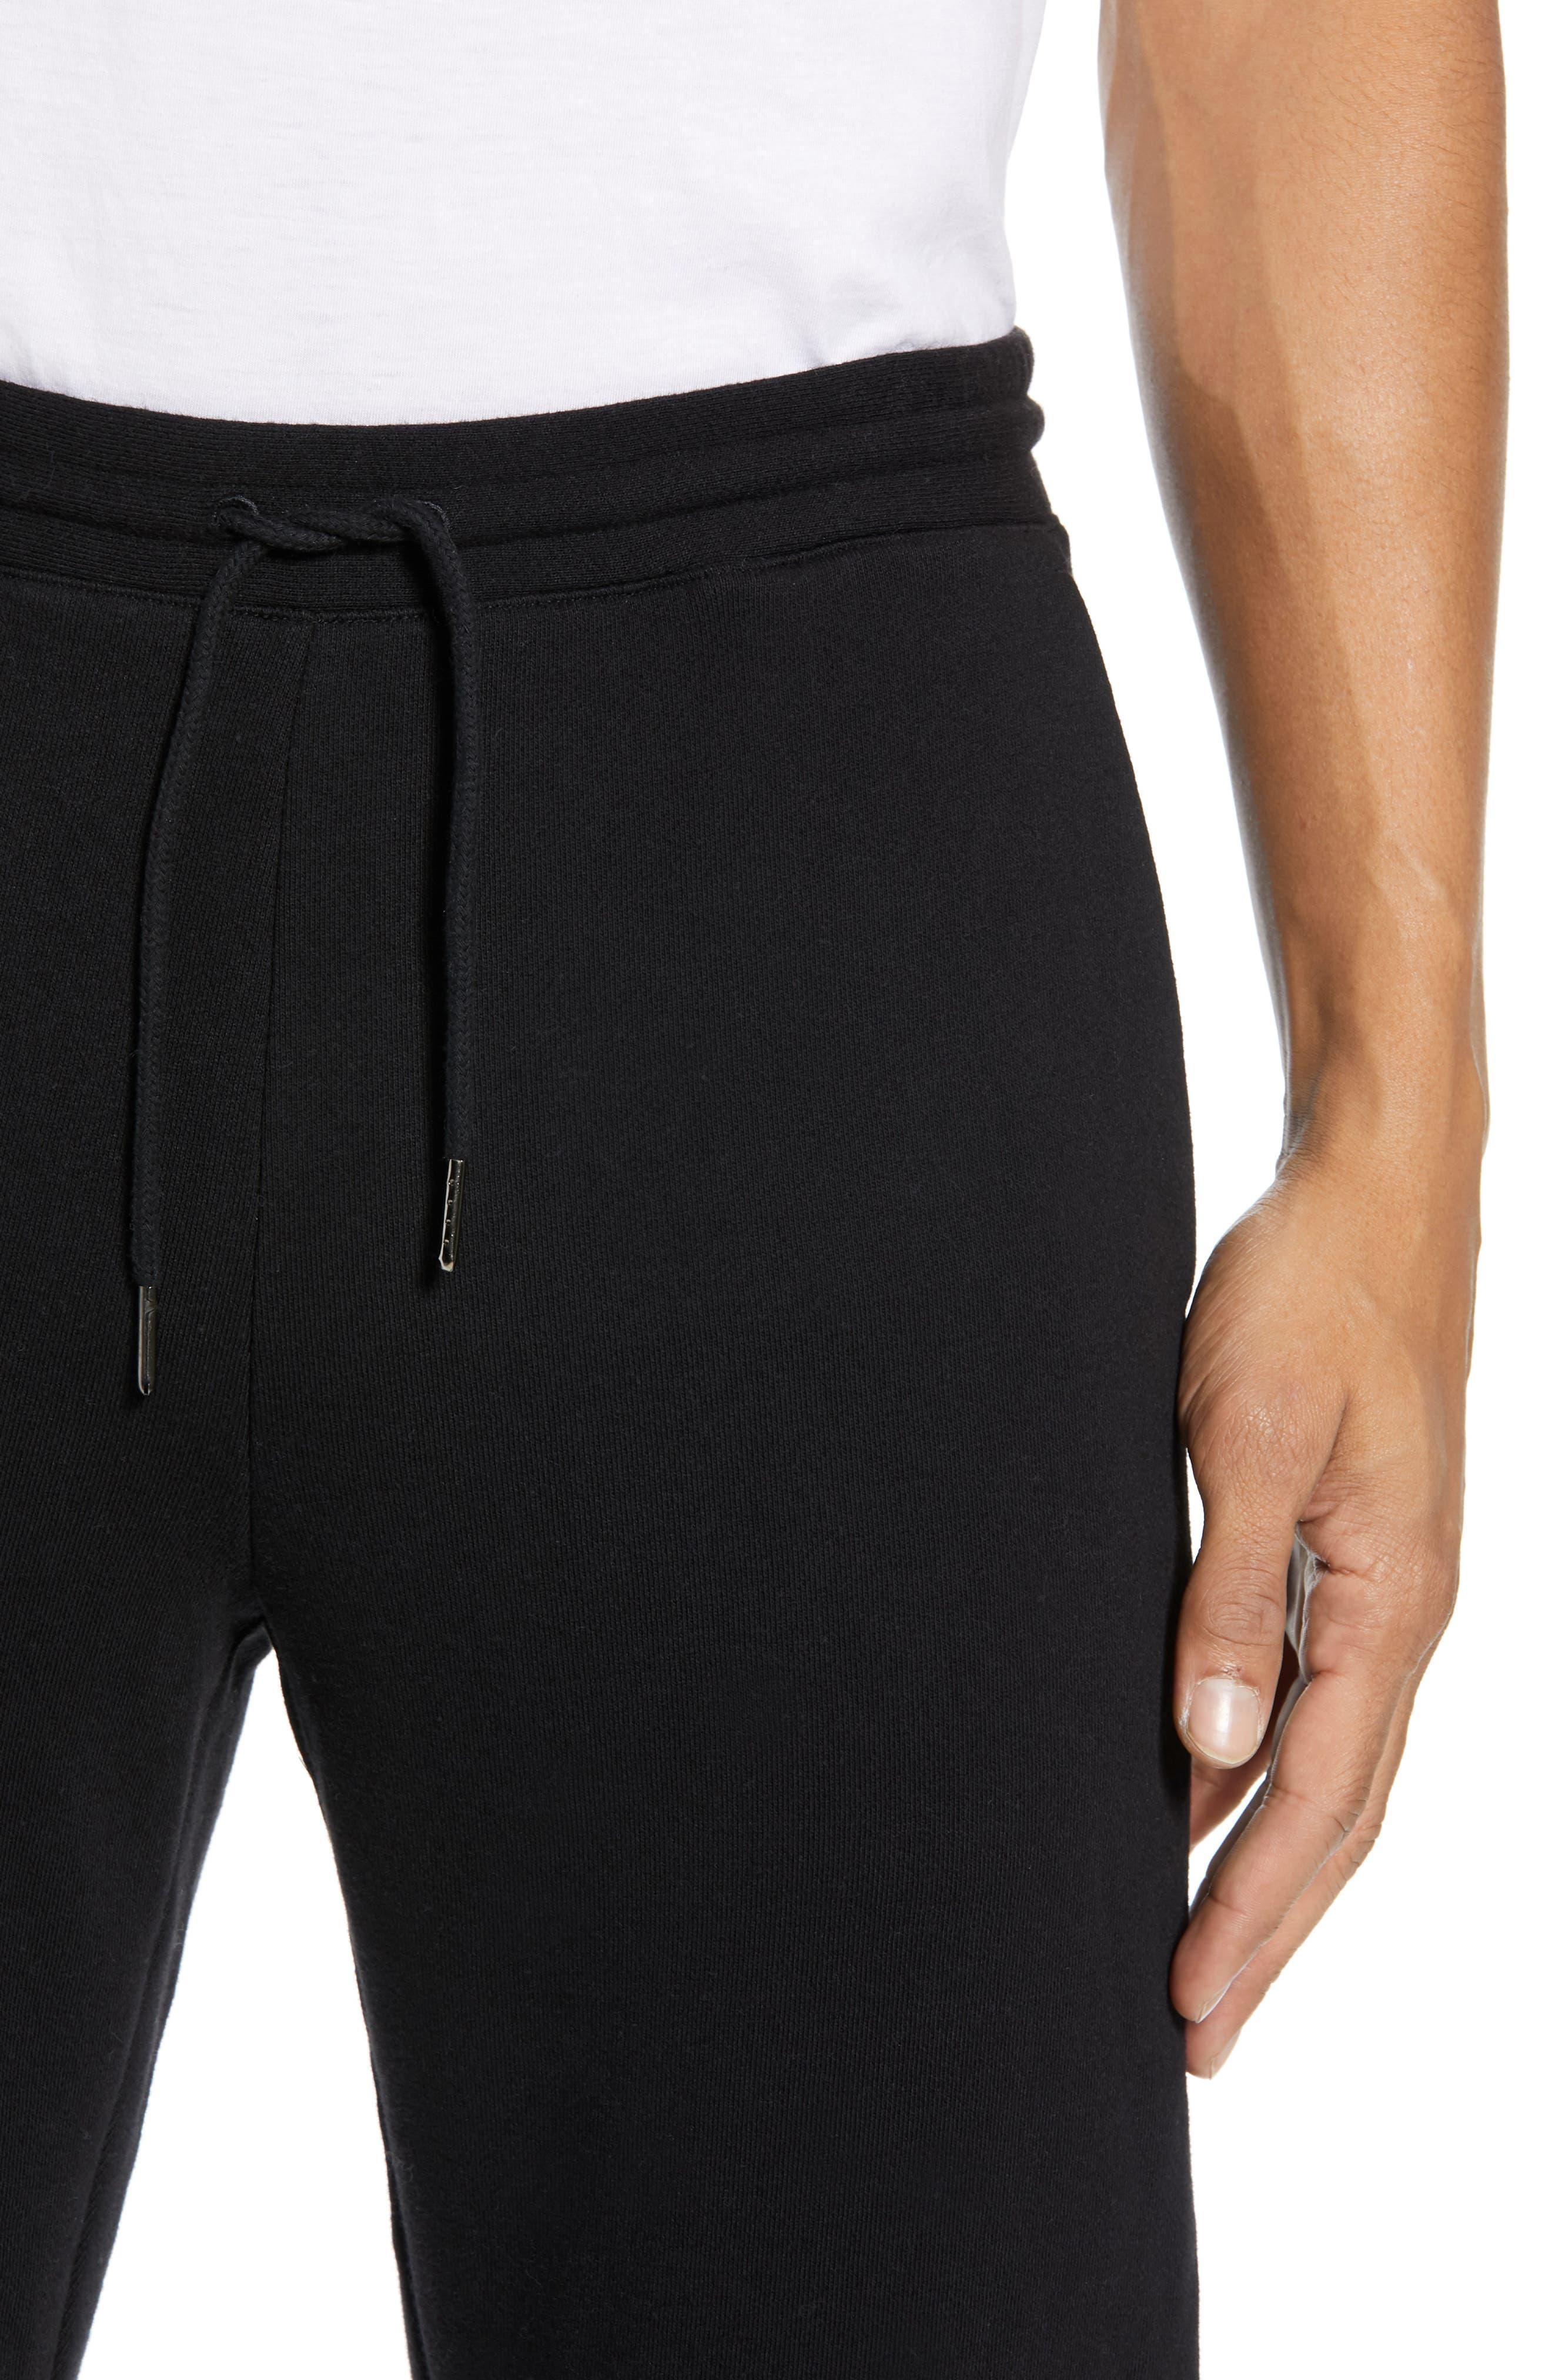 CLUB MONACO,                             Articulated Seam Jogger Pants,                             Alternate thumbnail 4, color,                             001